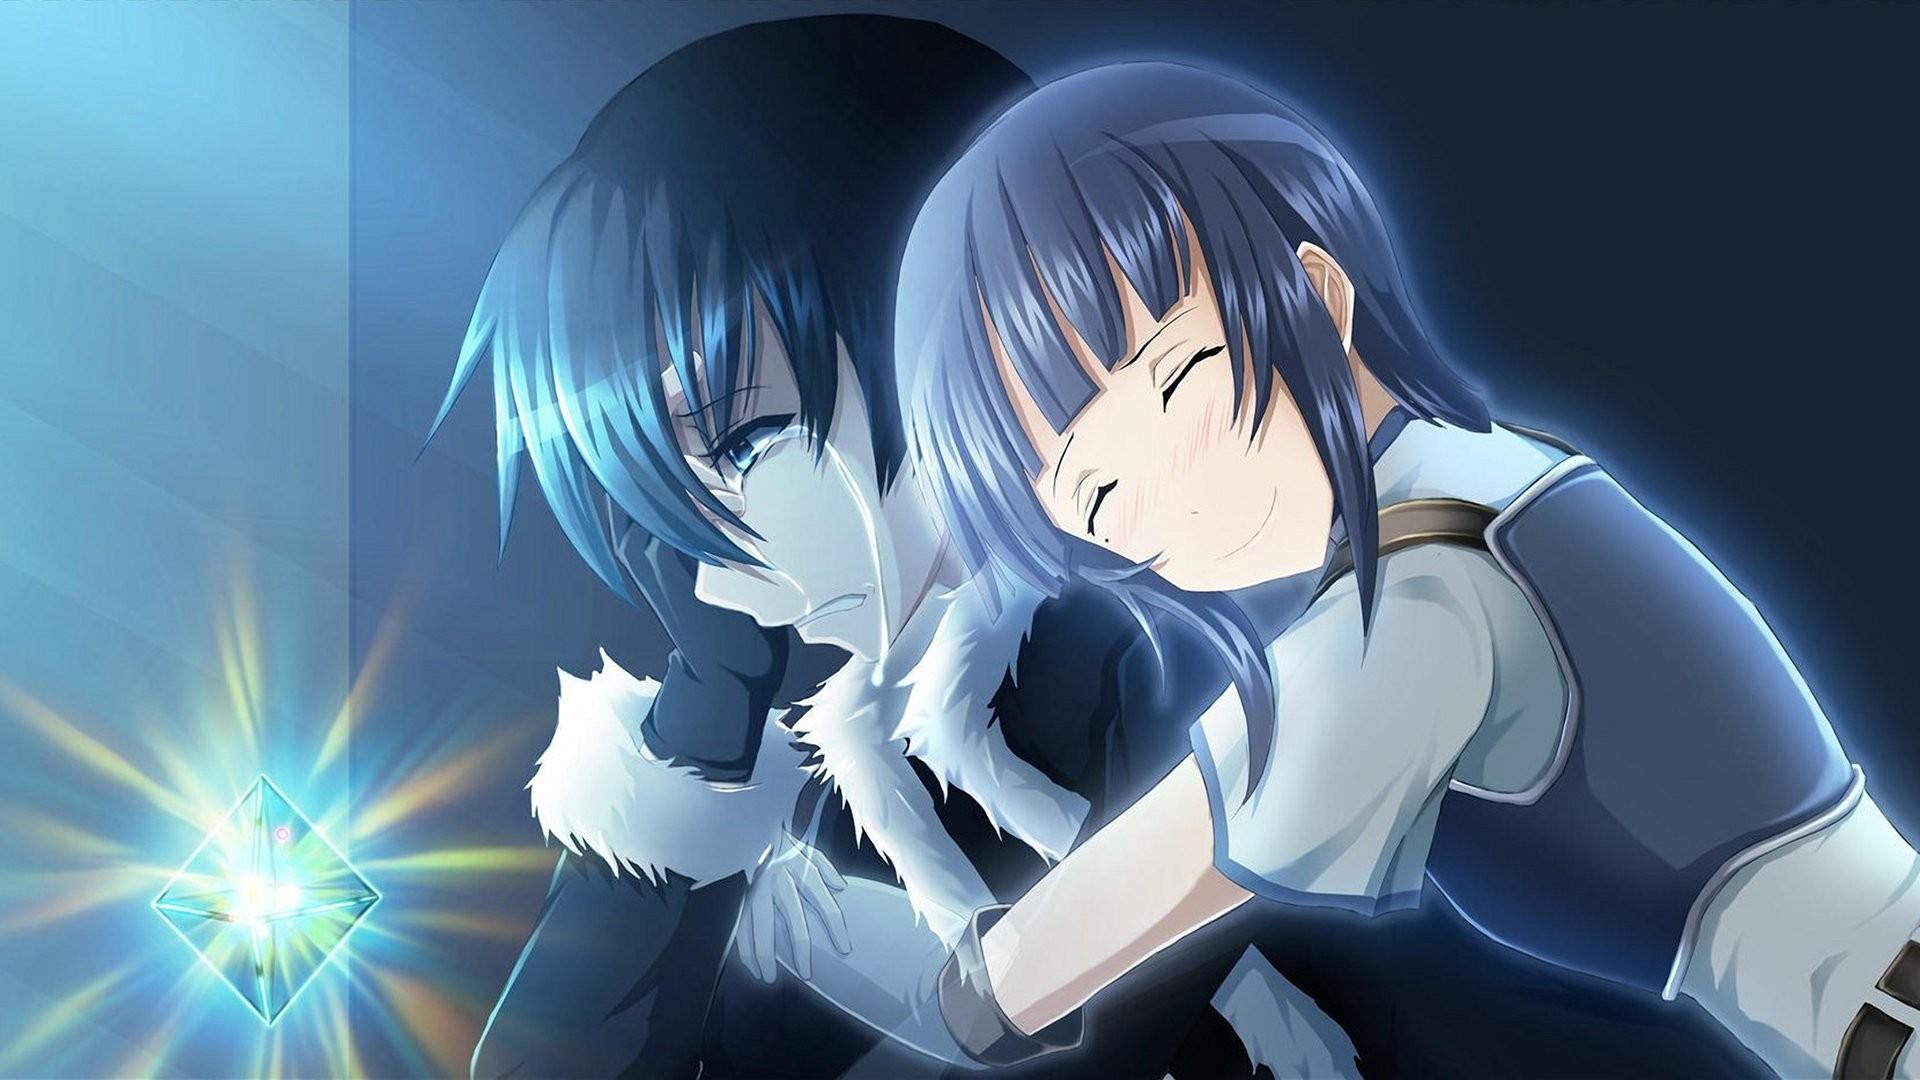 HD Wallpaper | Background ID:740087. Anime Sword Art Online